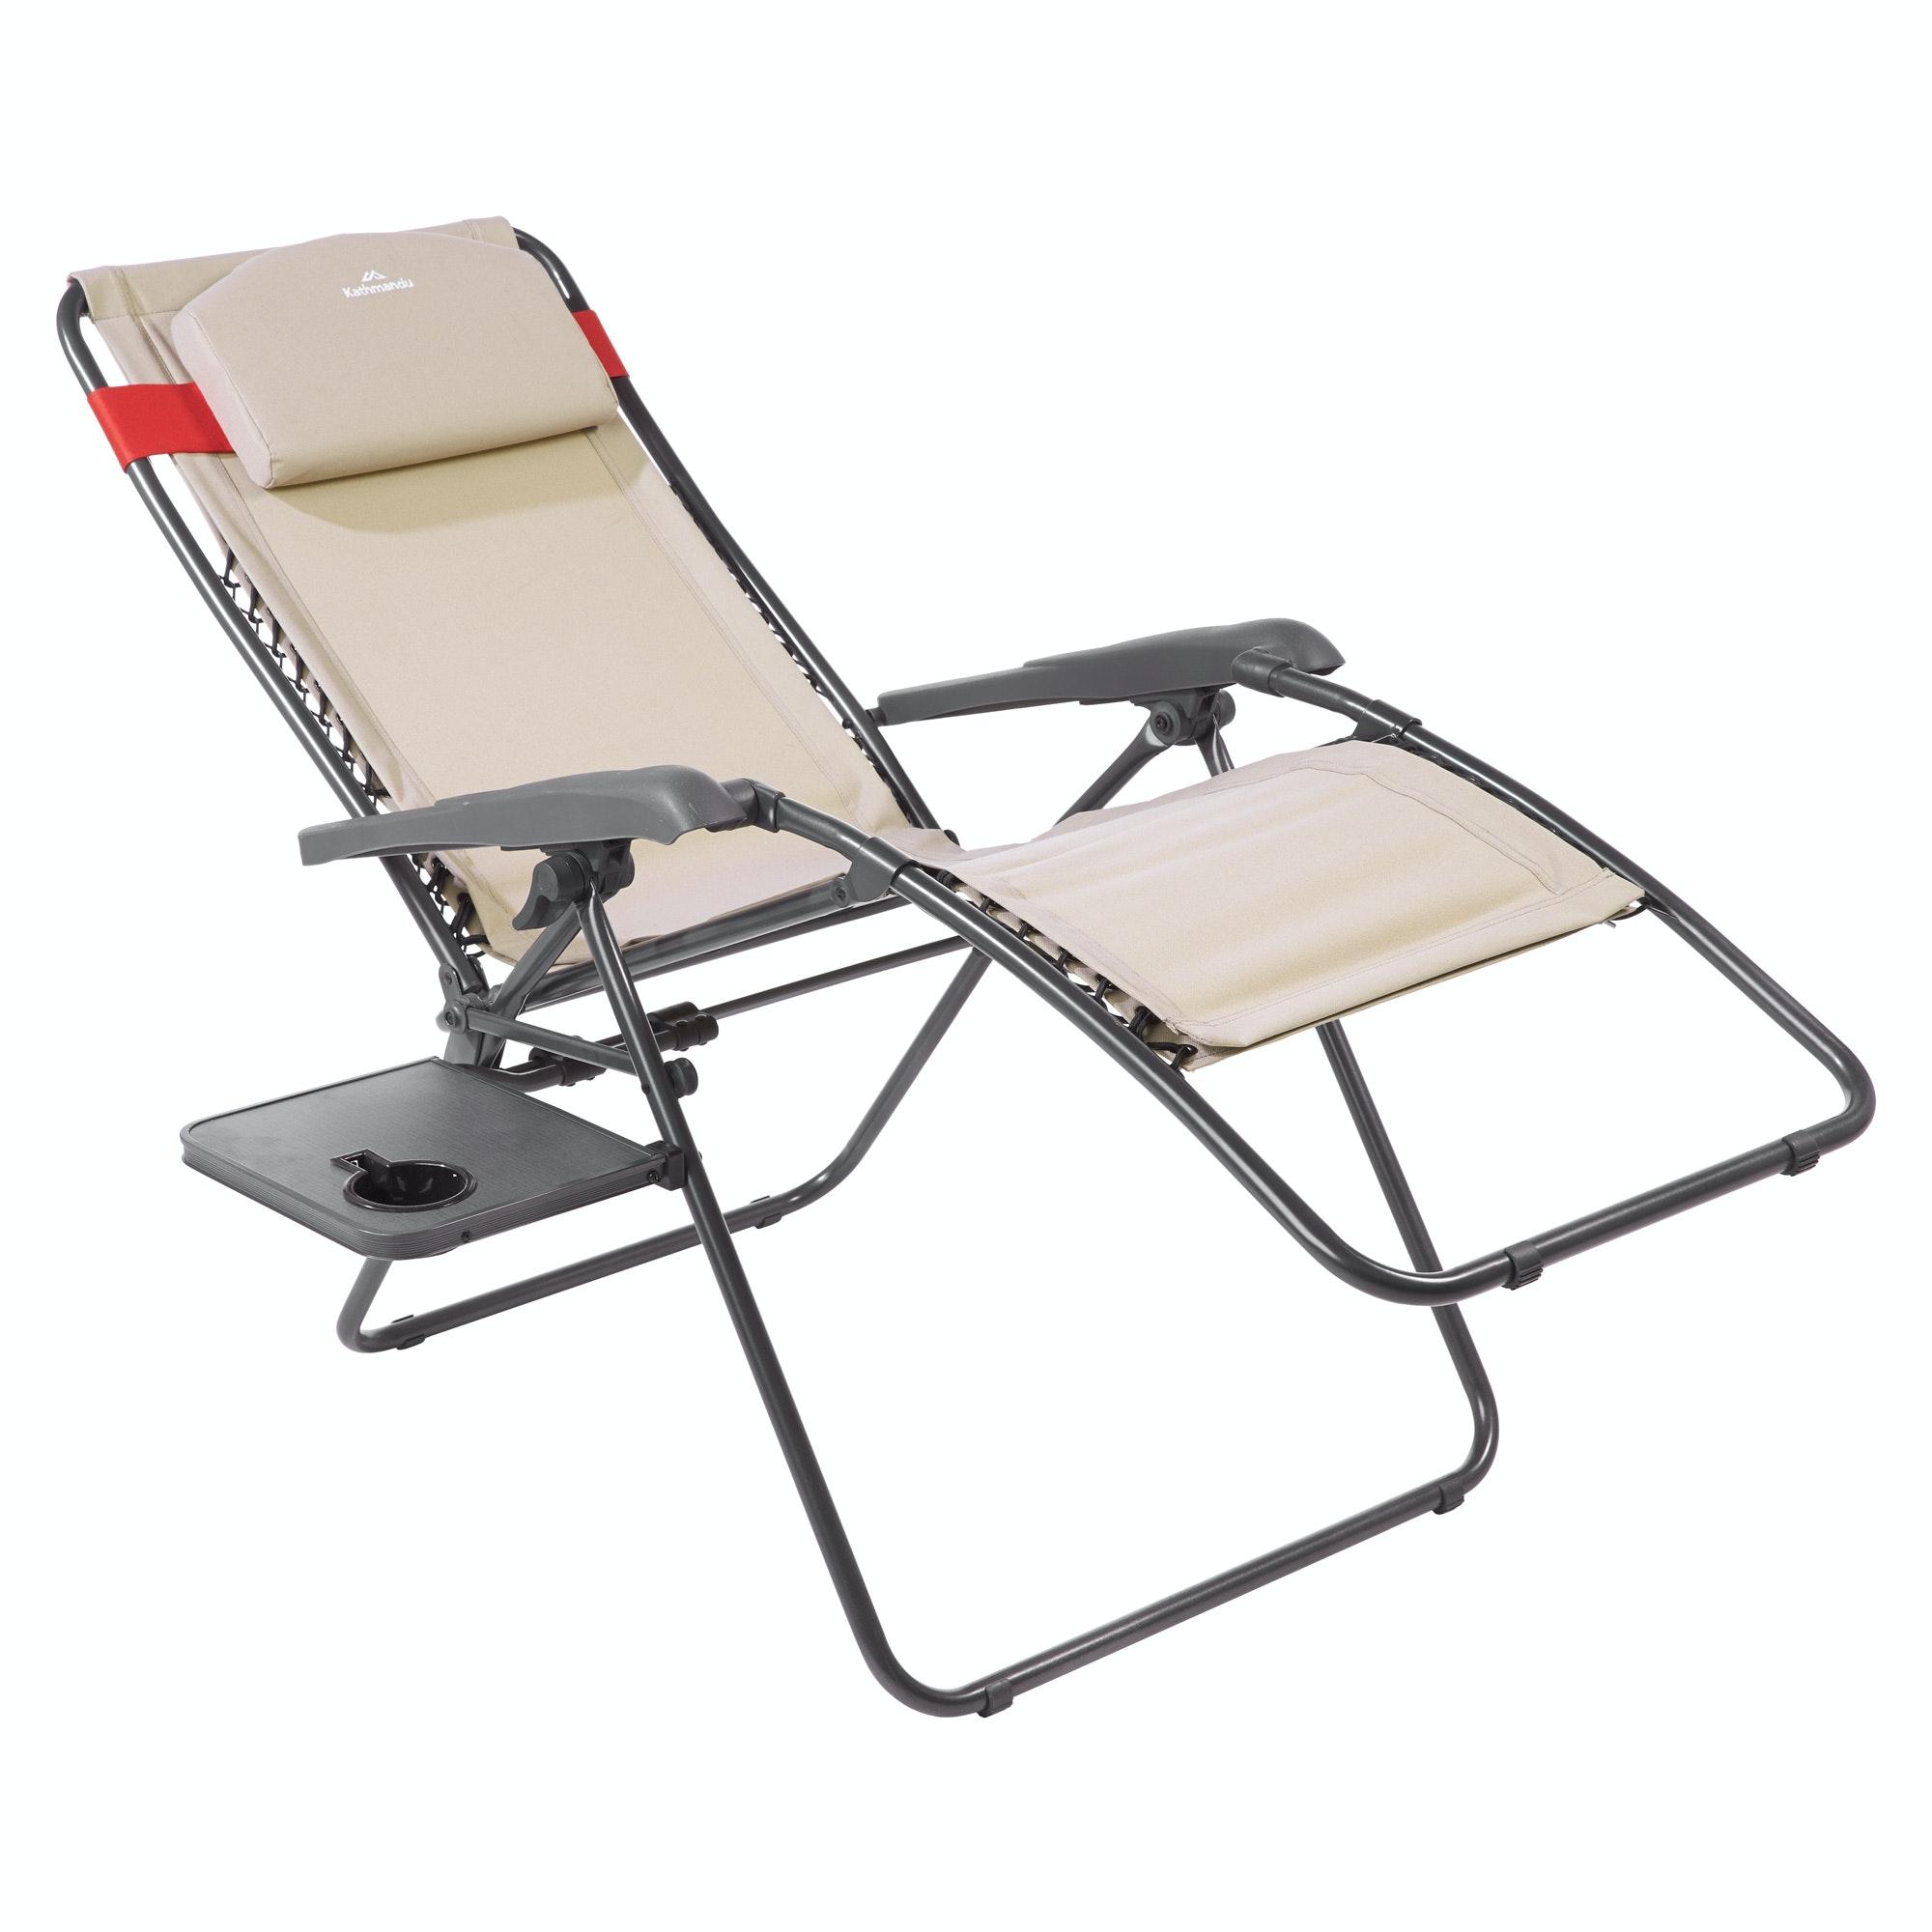 Cabana Lounger Chair